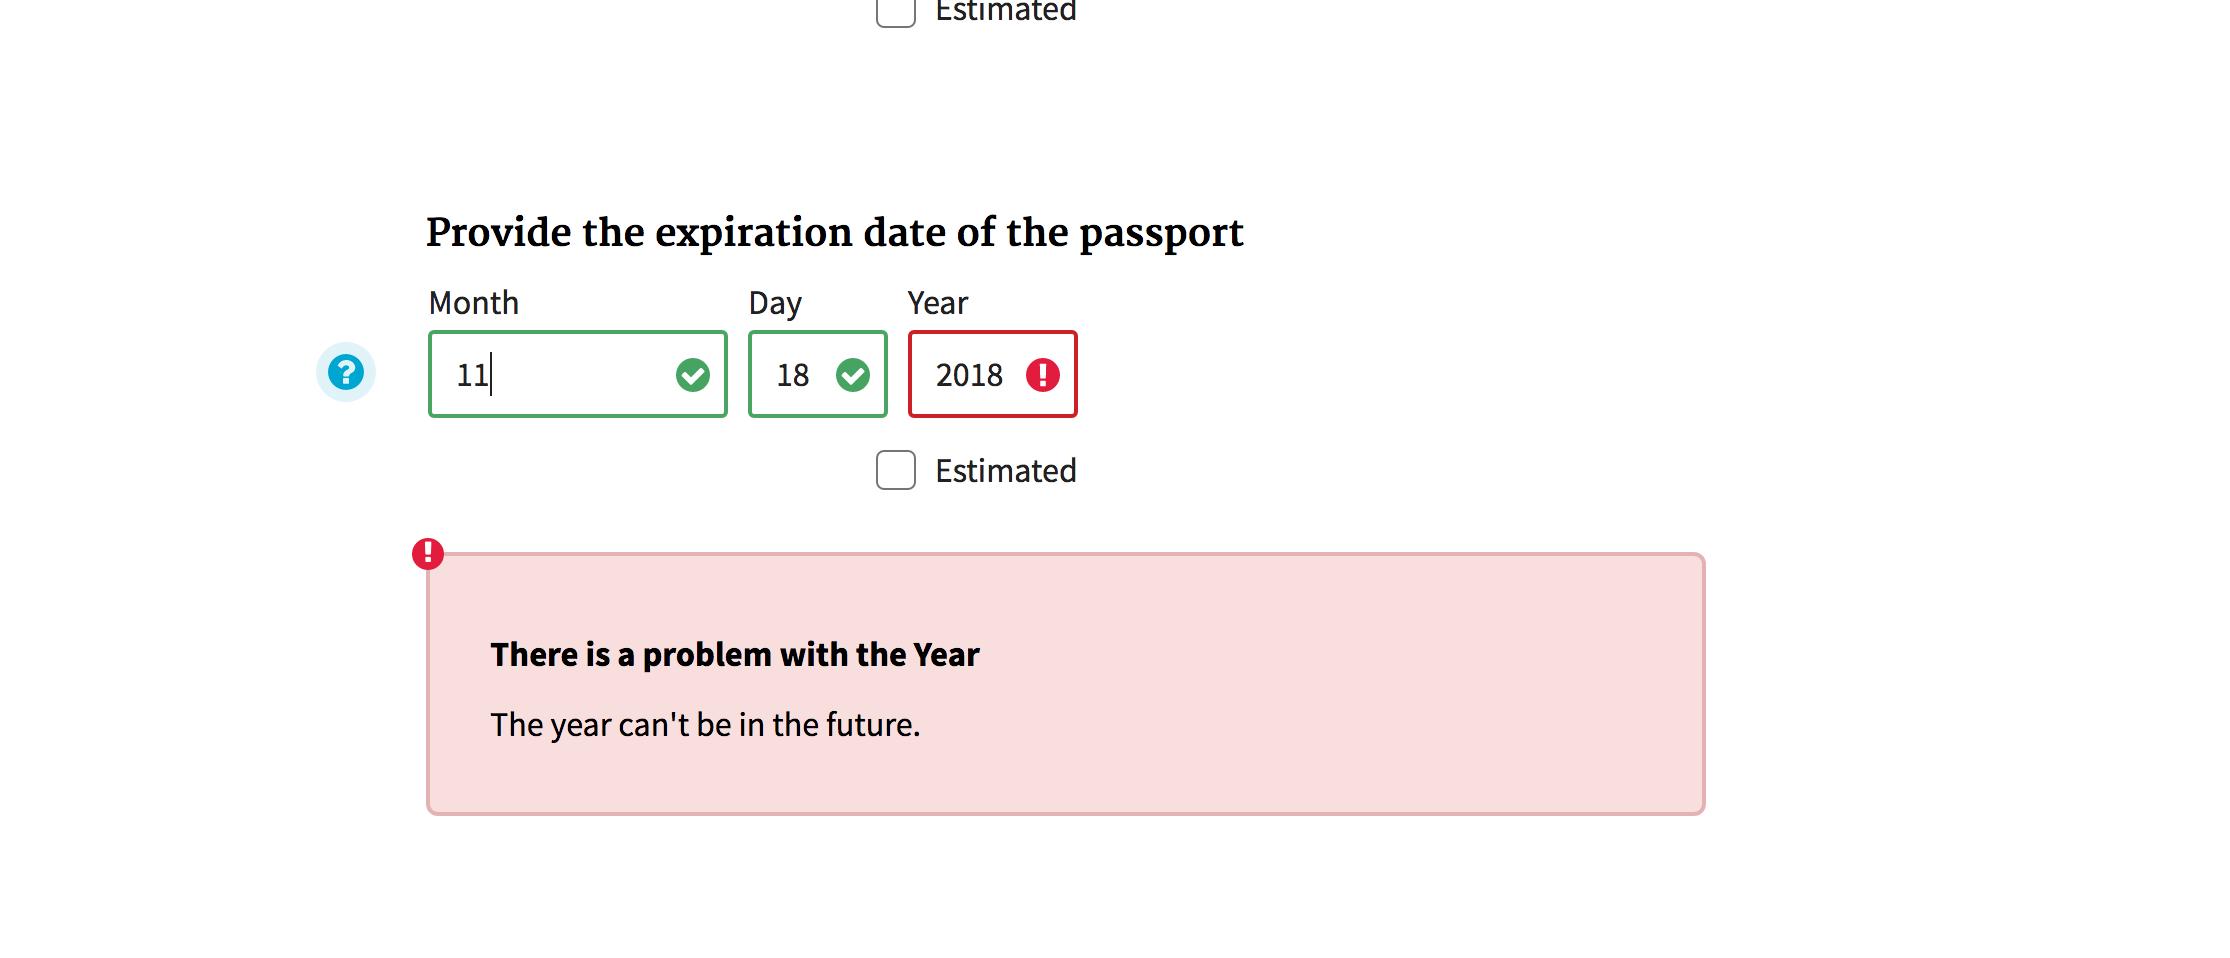 Passport expiration date in Australia